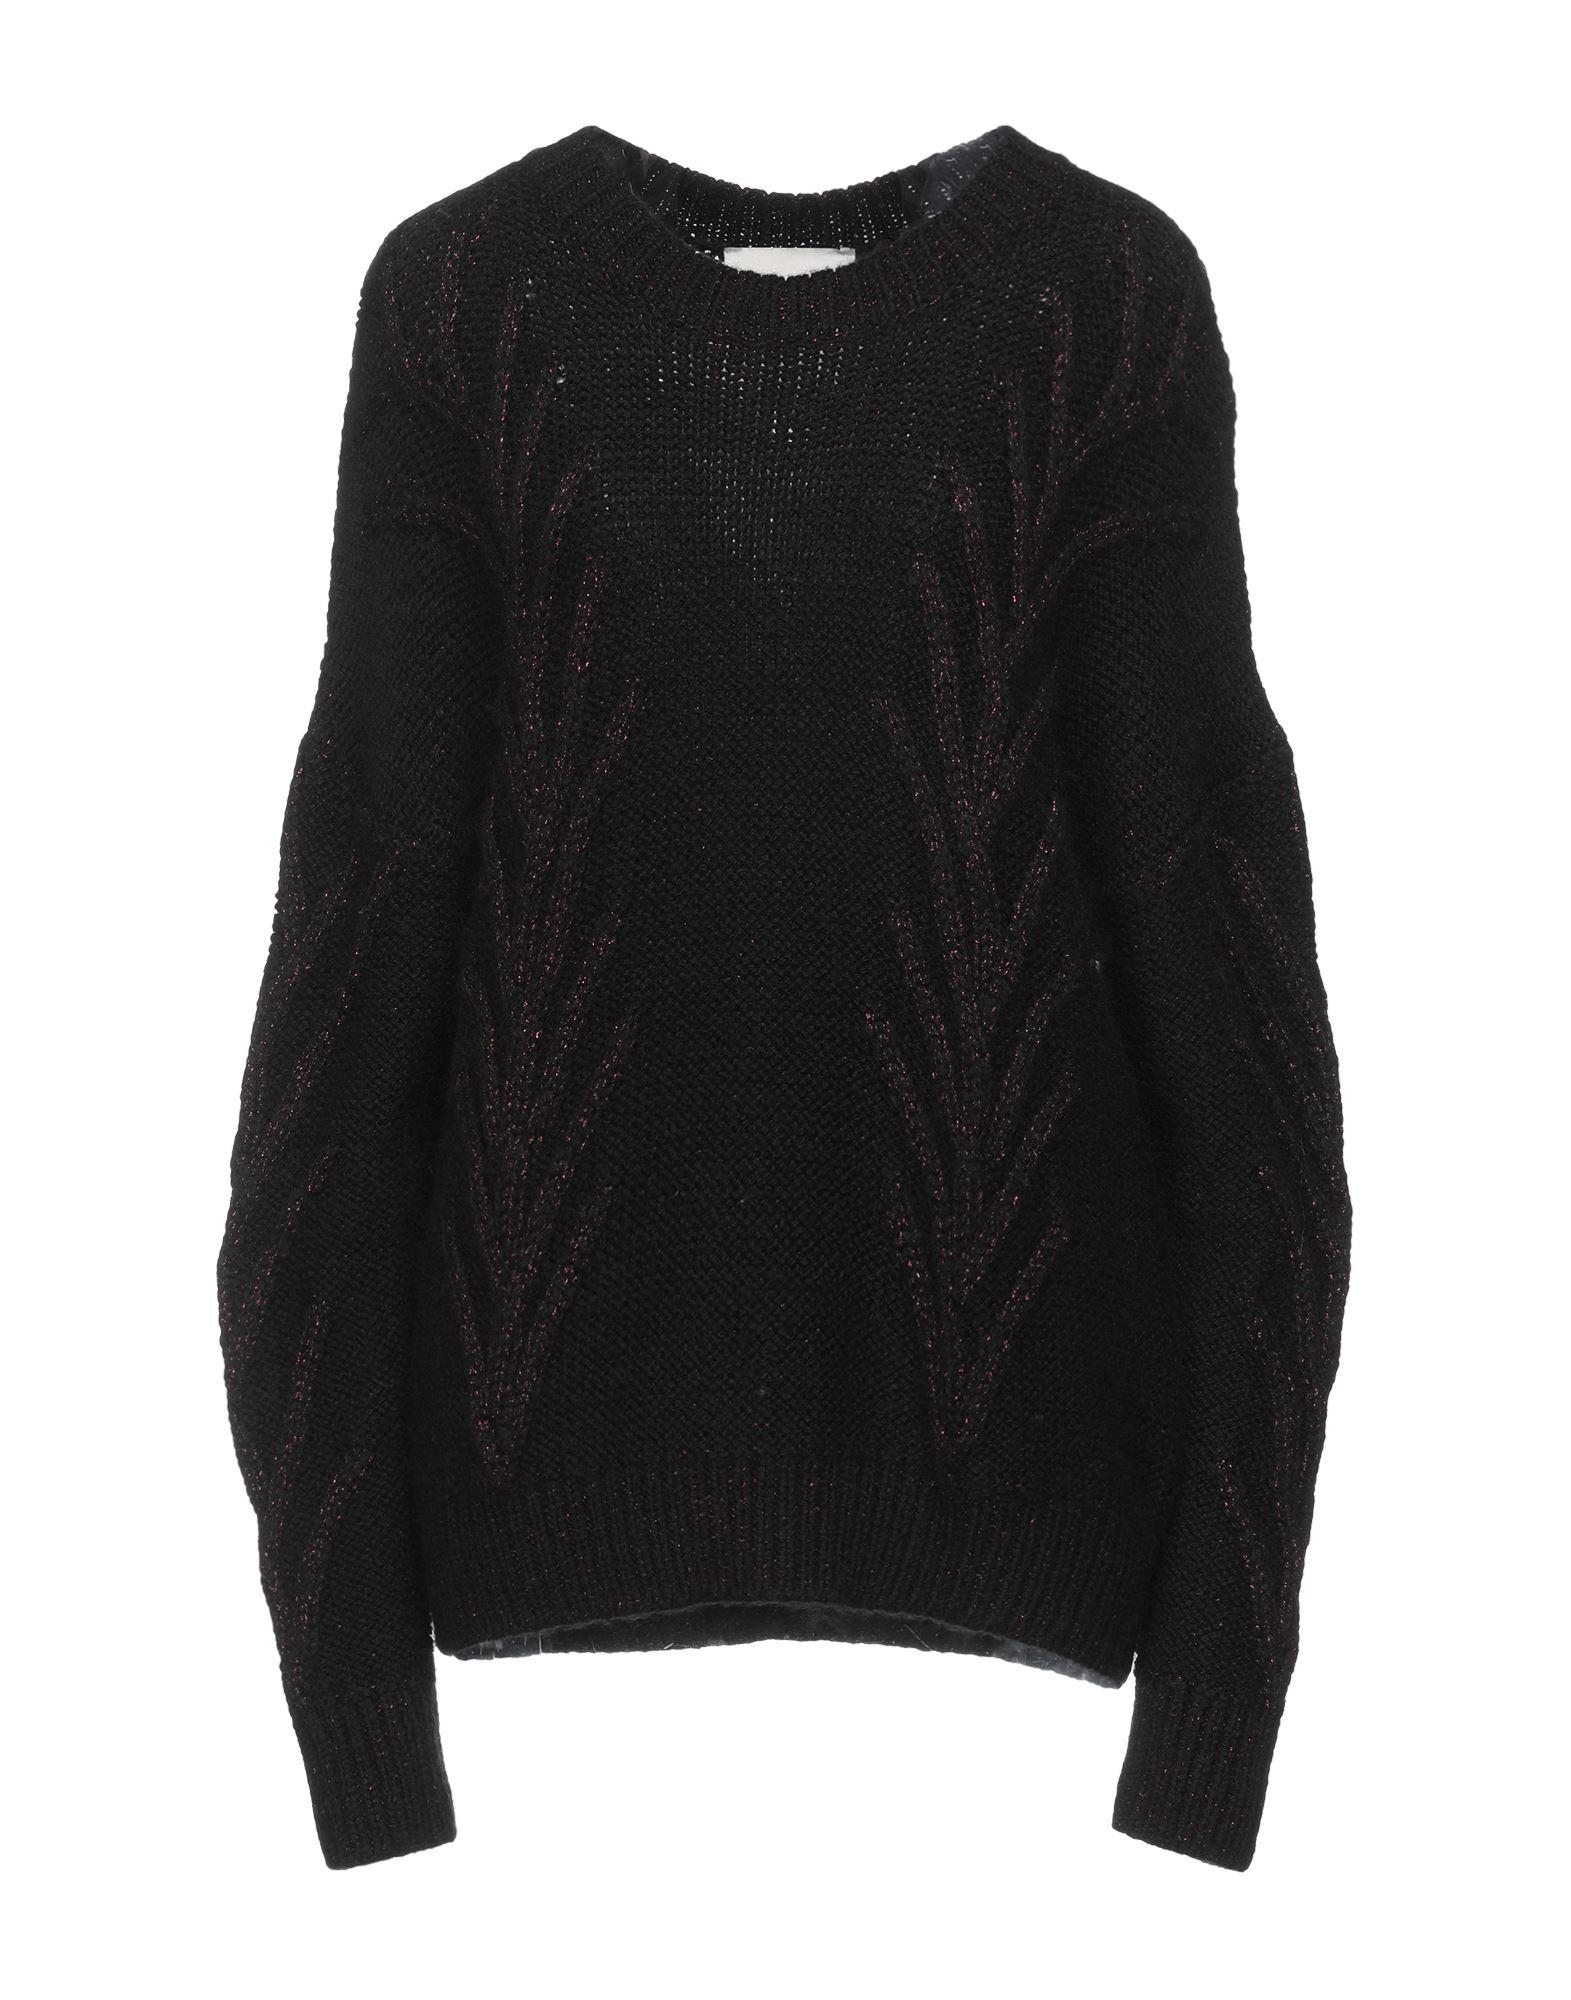 Marco De Vincenzo Sweaters In Black